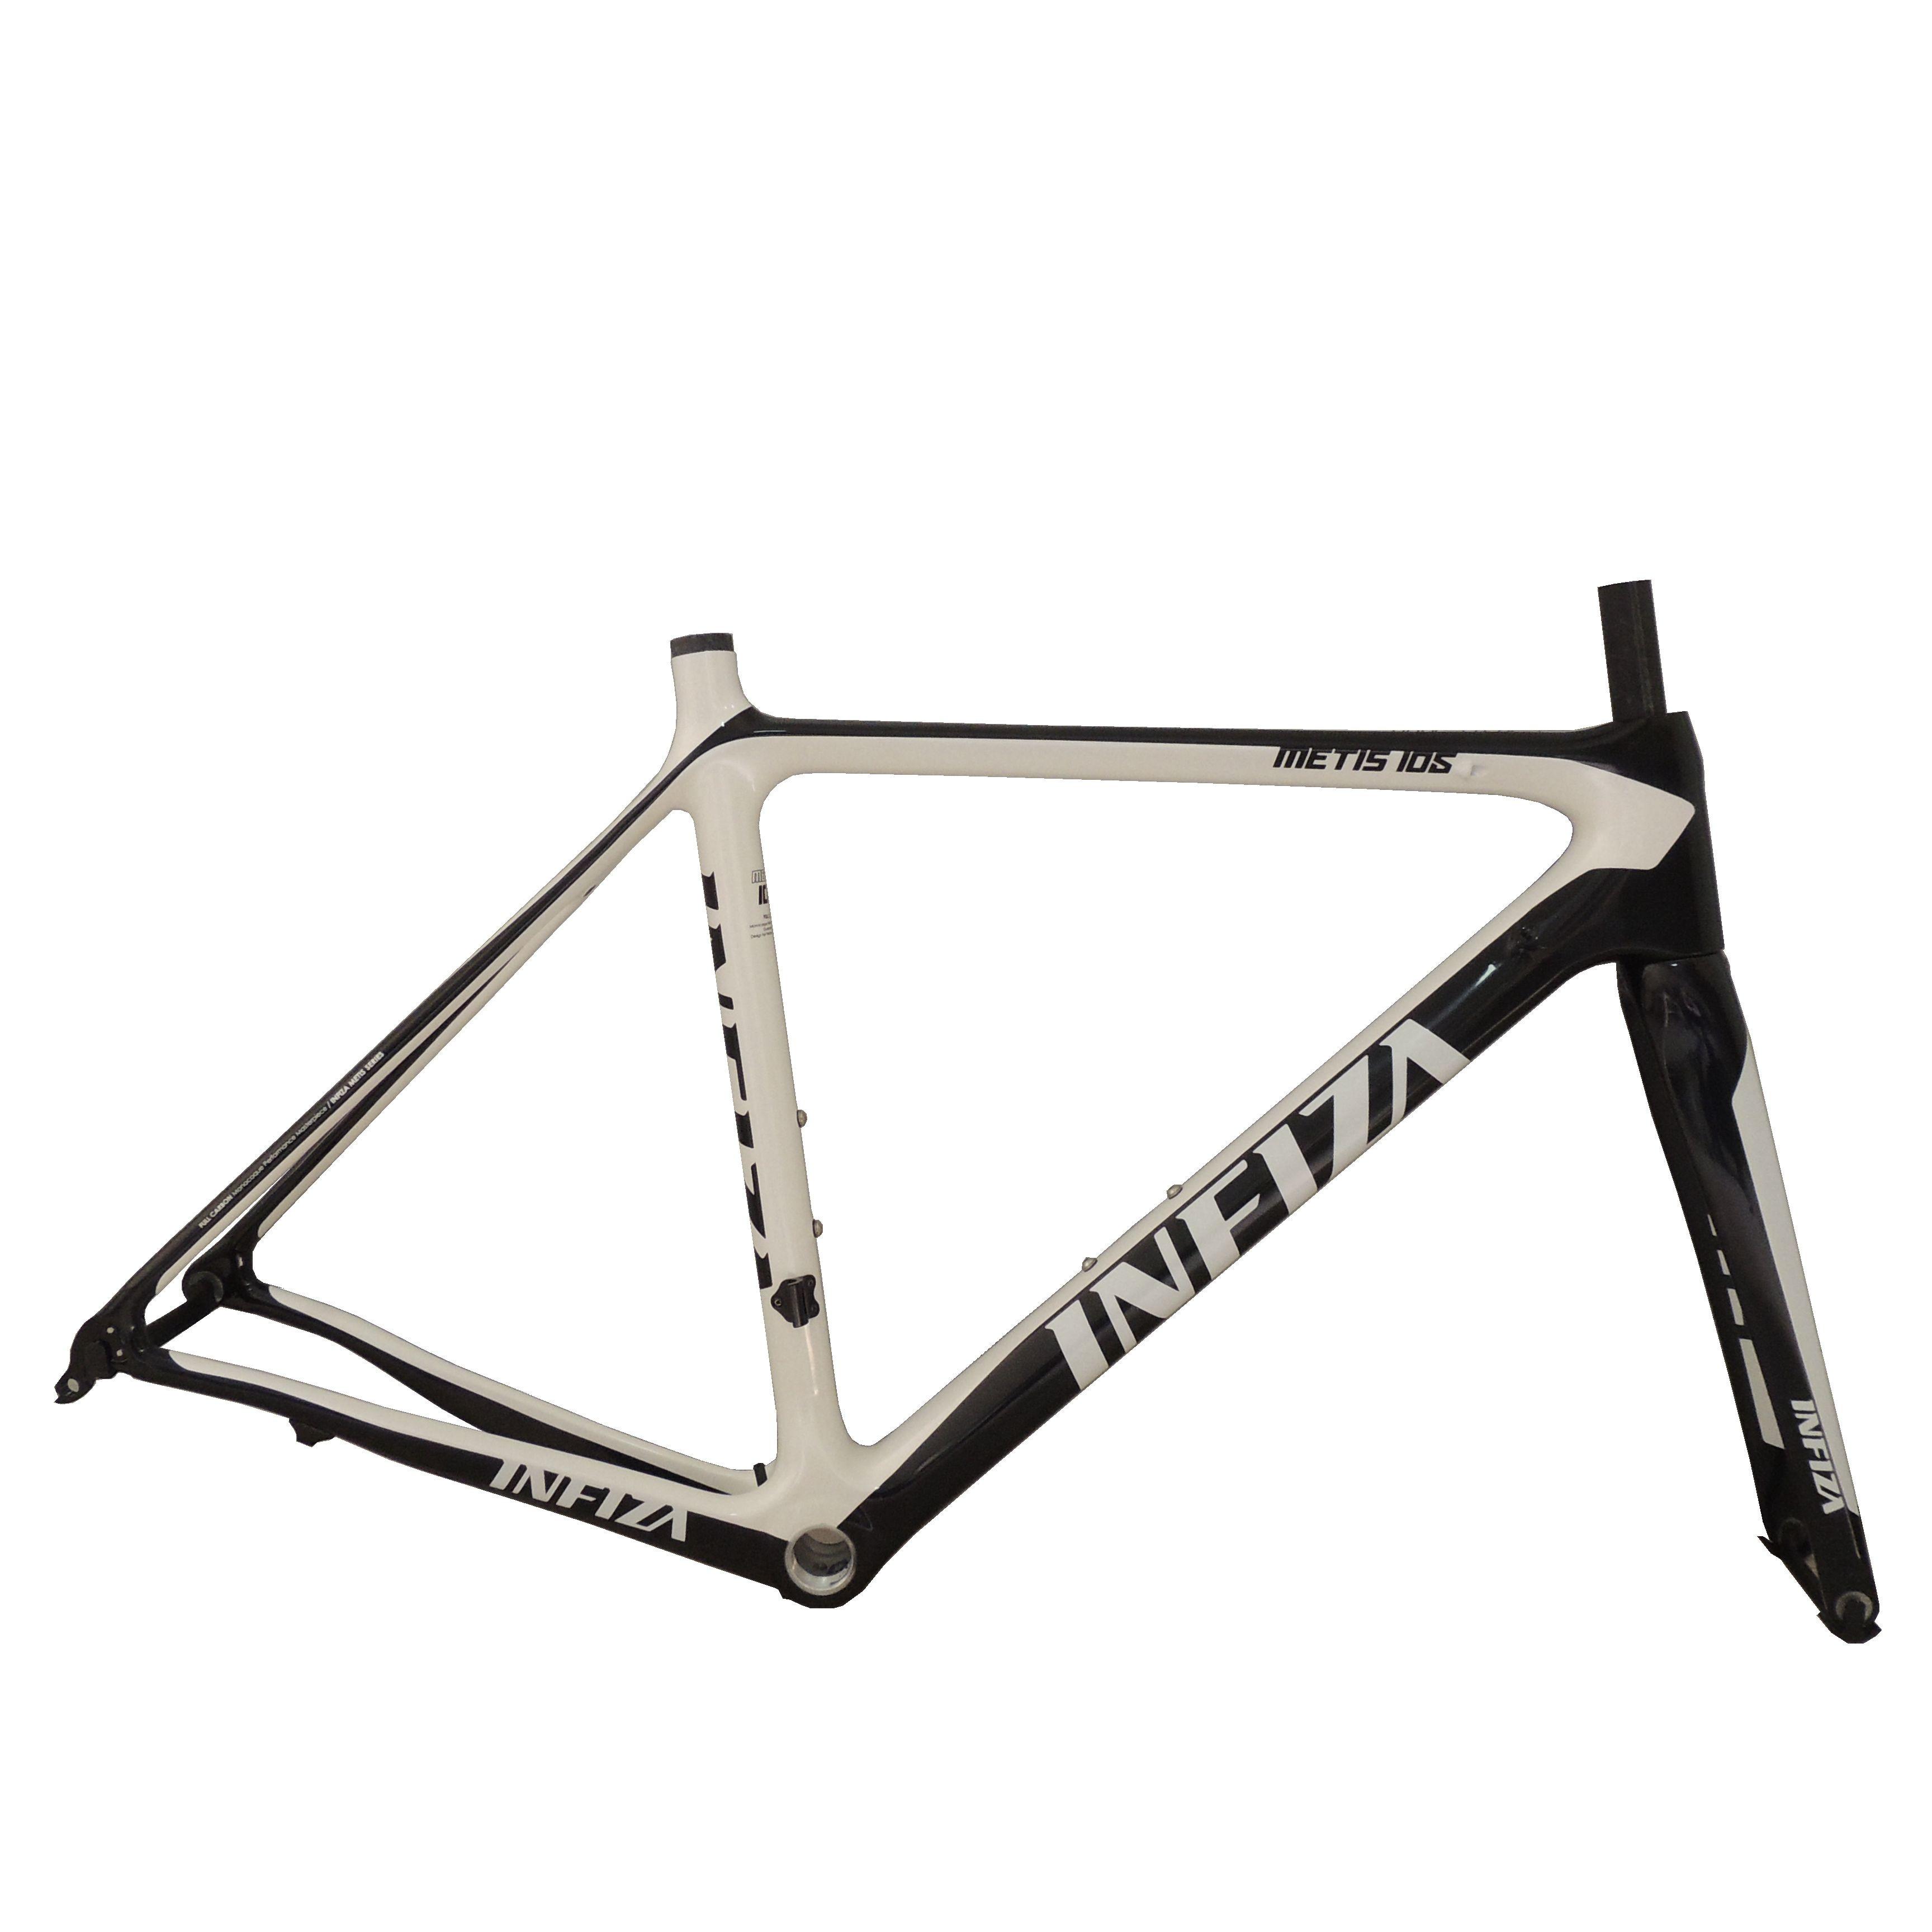 New High Quality 700c Carbon Frame Super Light Inner Carble Road Bike Frame 51cm 52cm 54cm Full Carbon Bicycle Frame With Fork